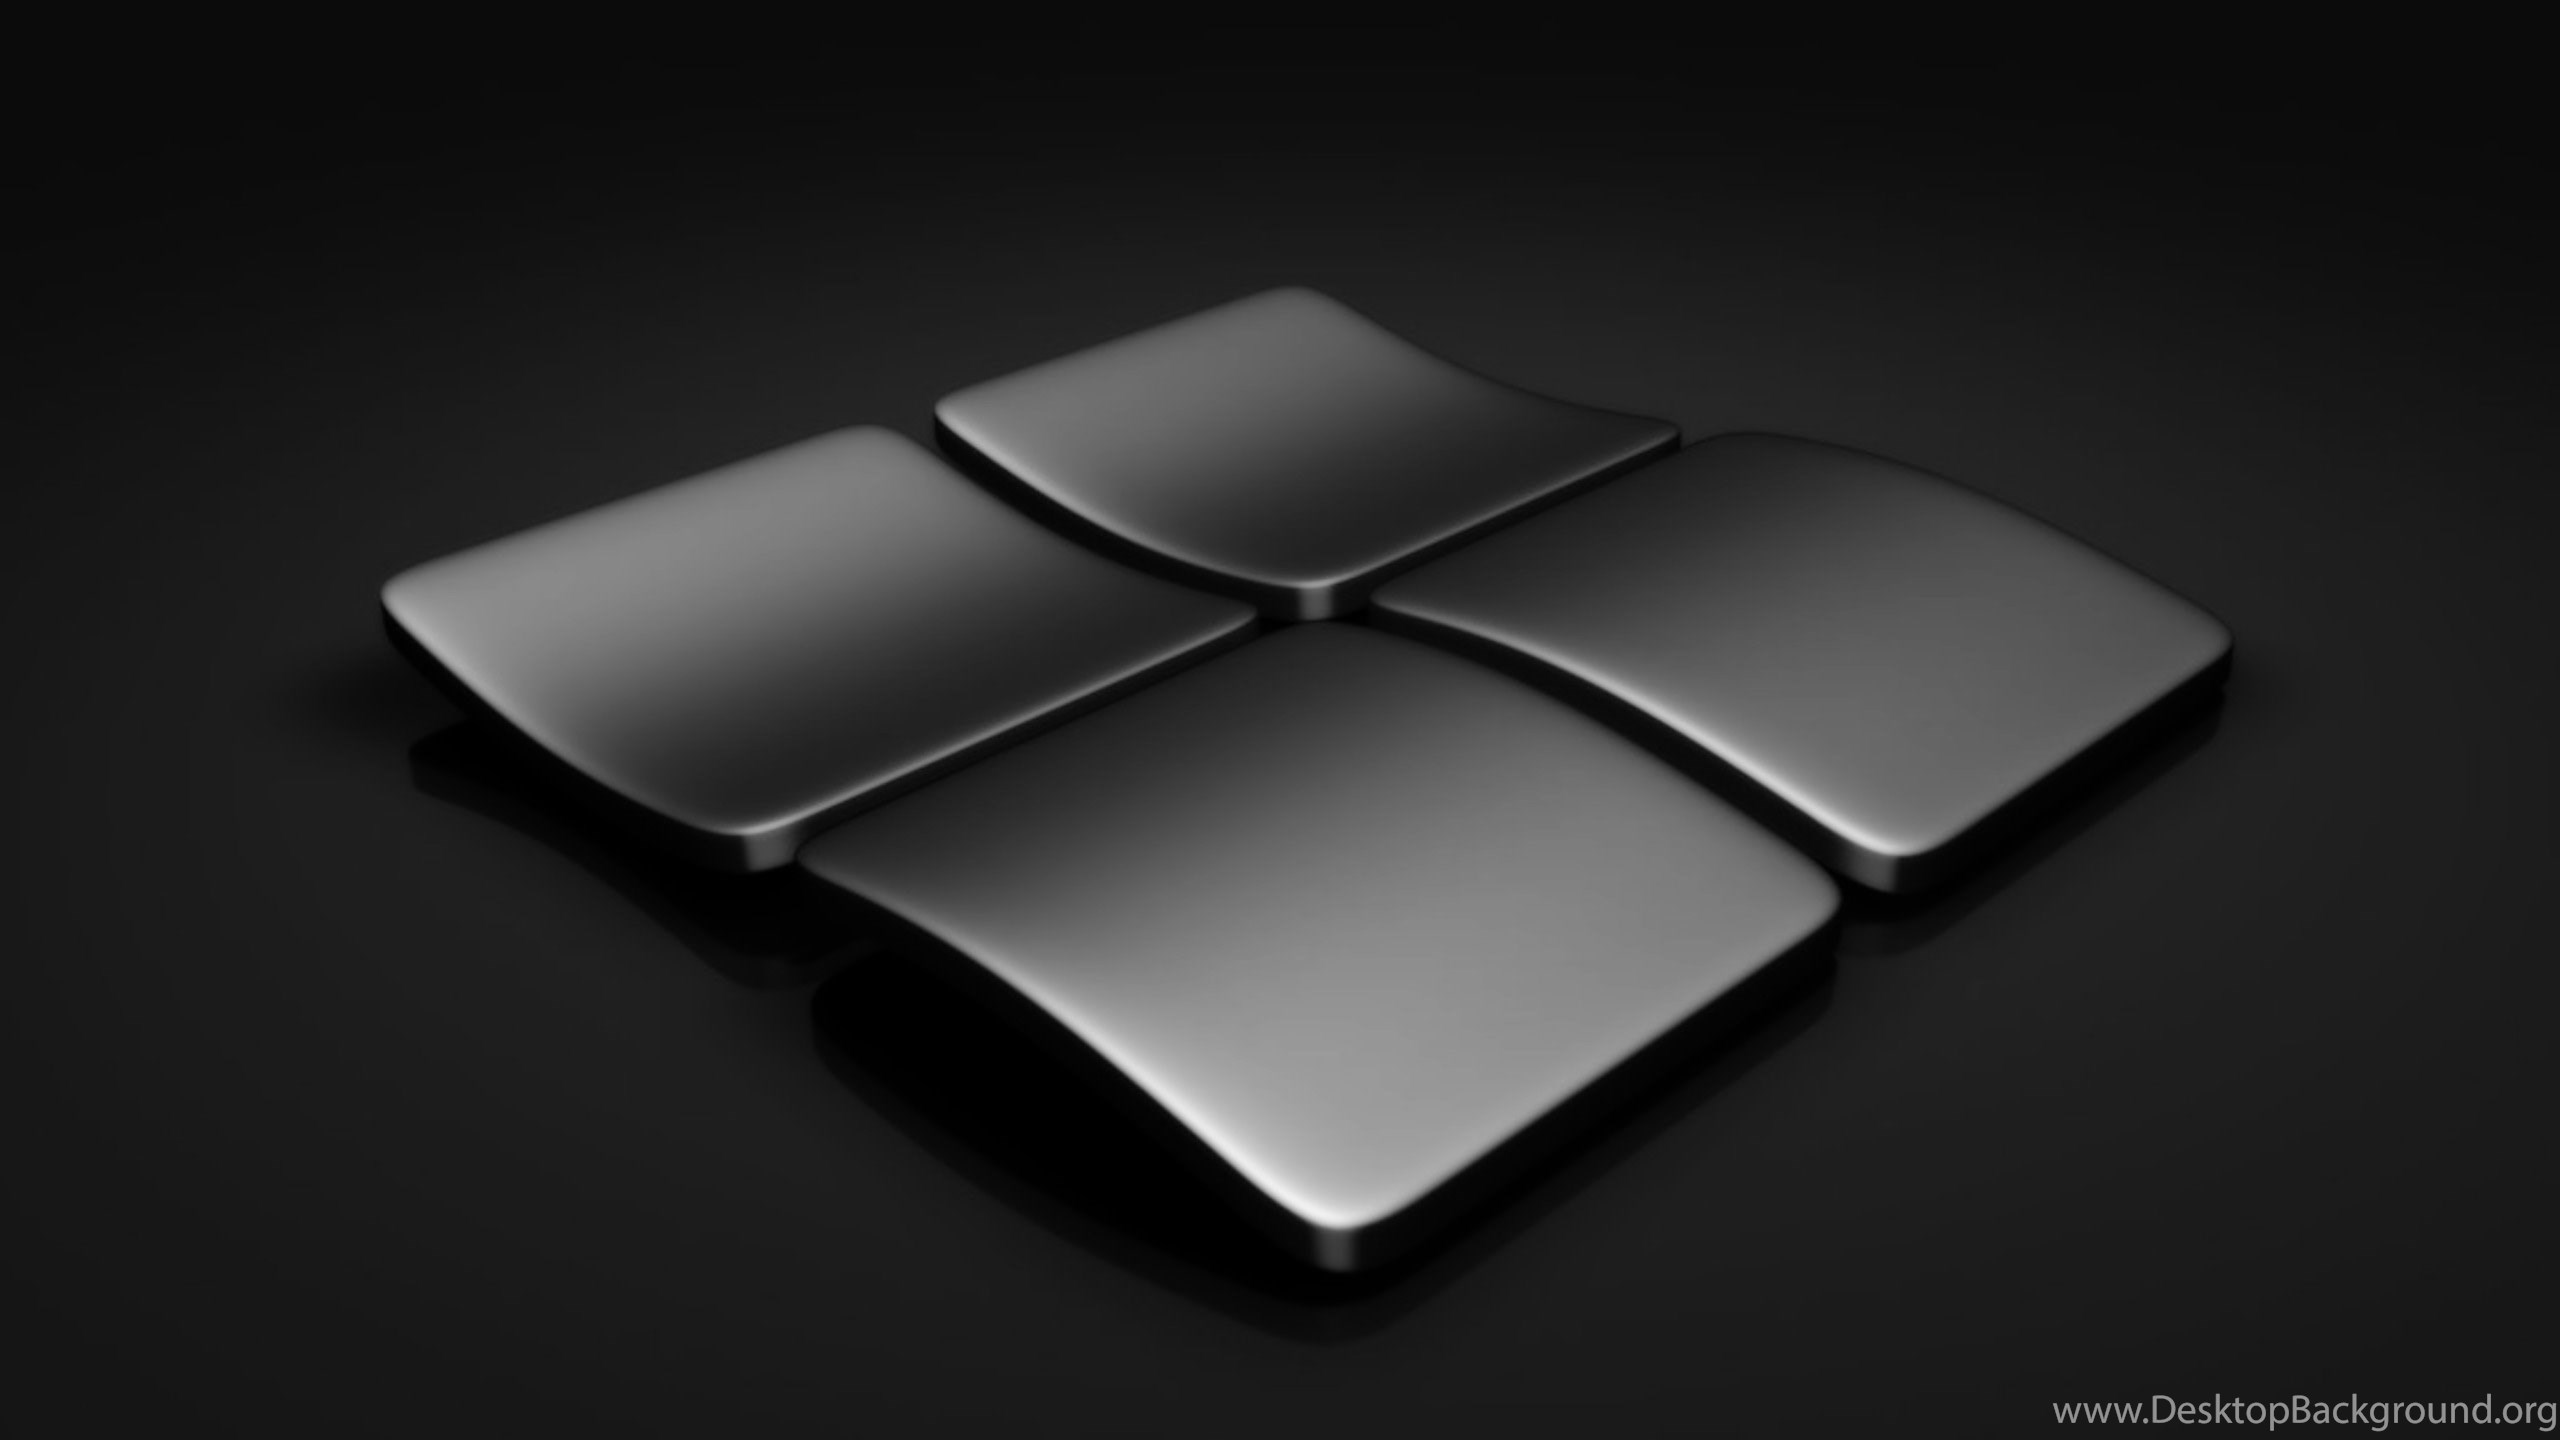 Windows 10 Wallpapers Black Logos Desktop Background